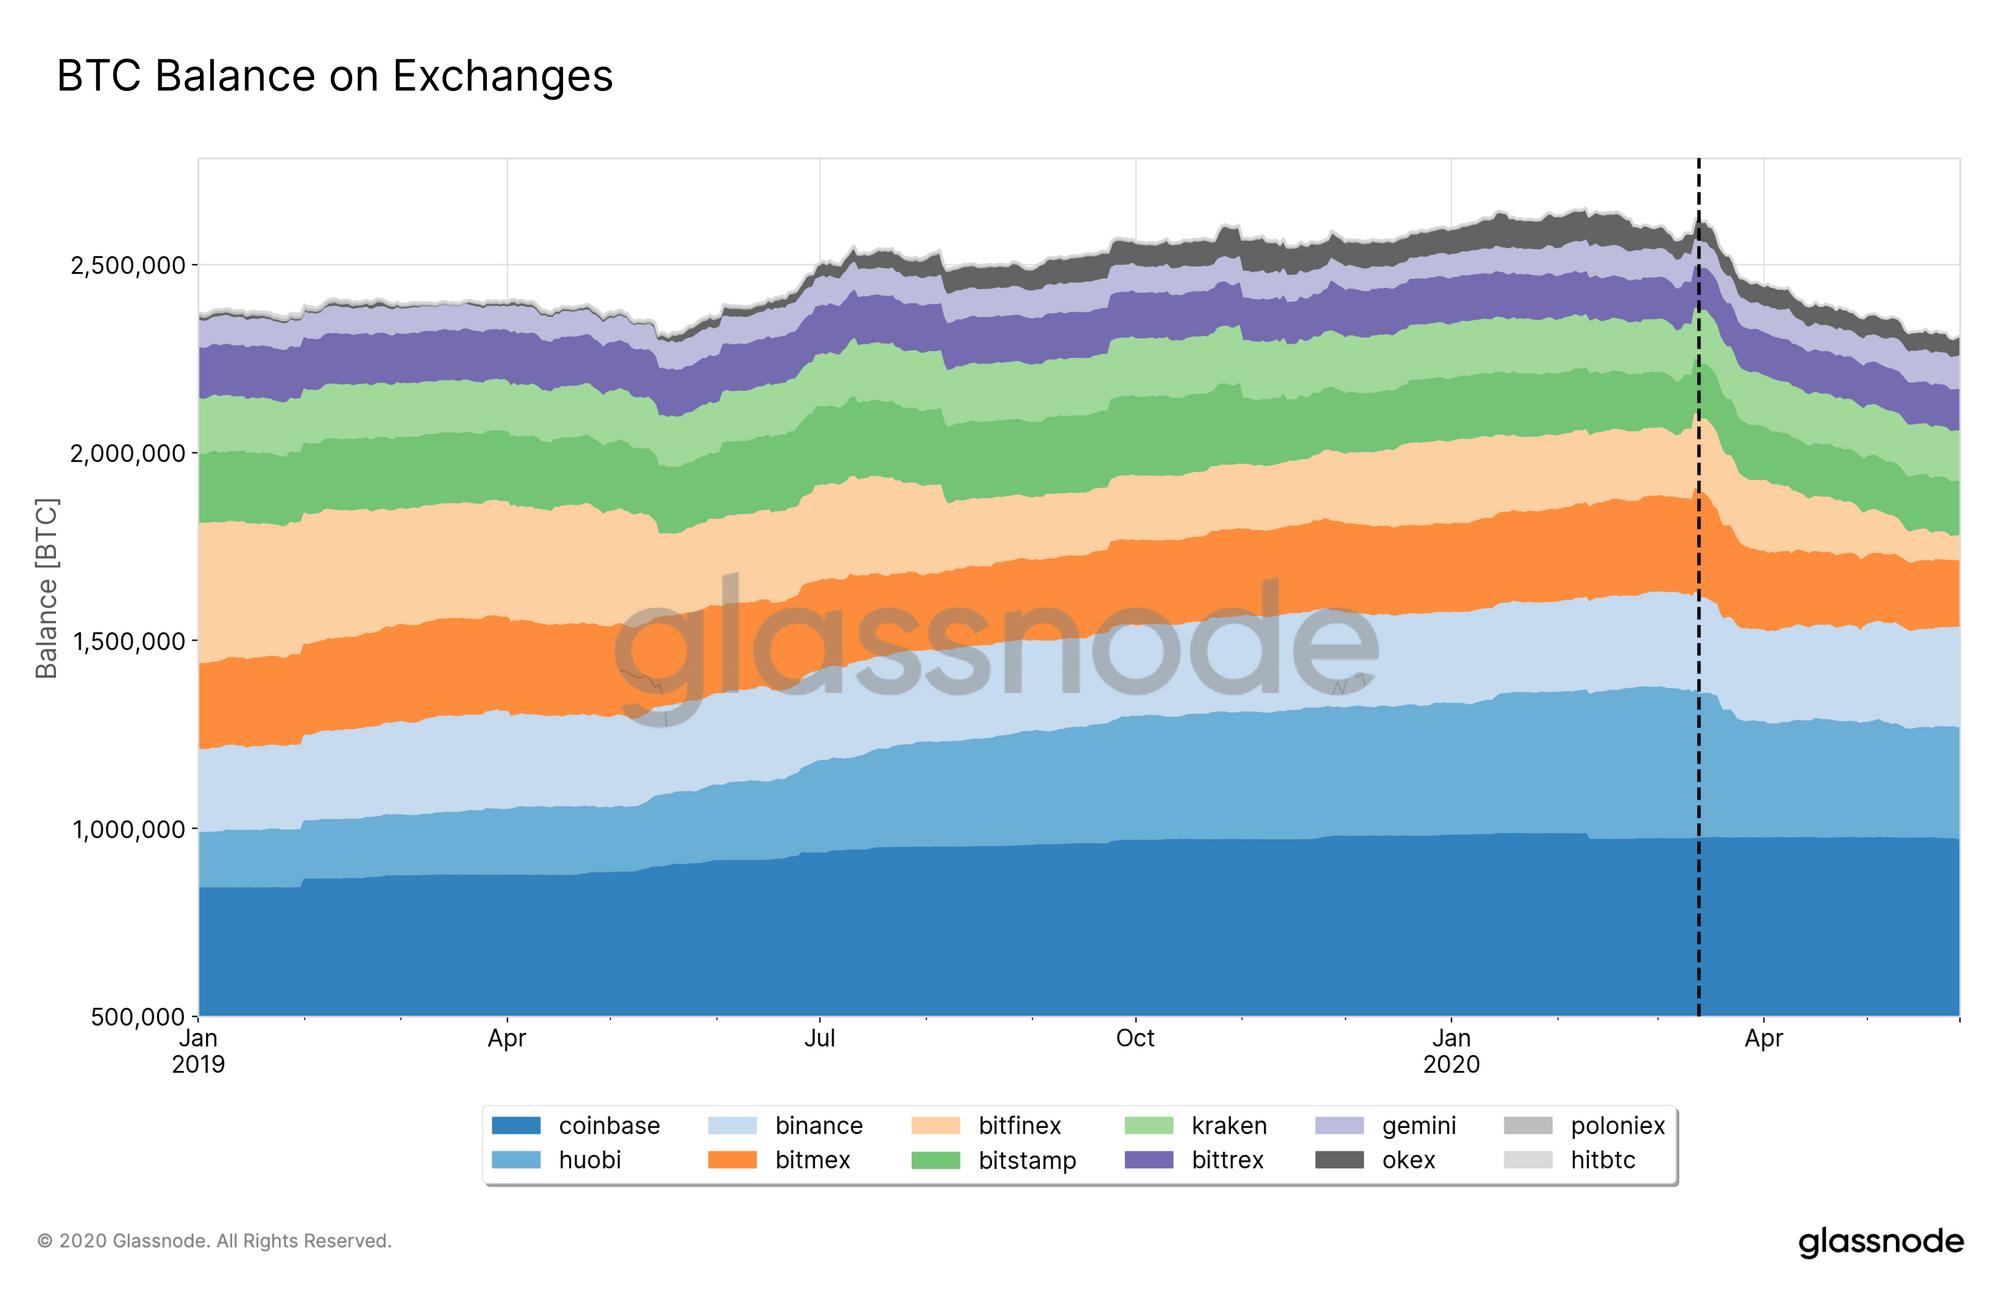 Glassnode - BTC Balance on Exchanges